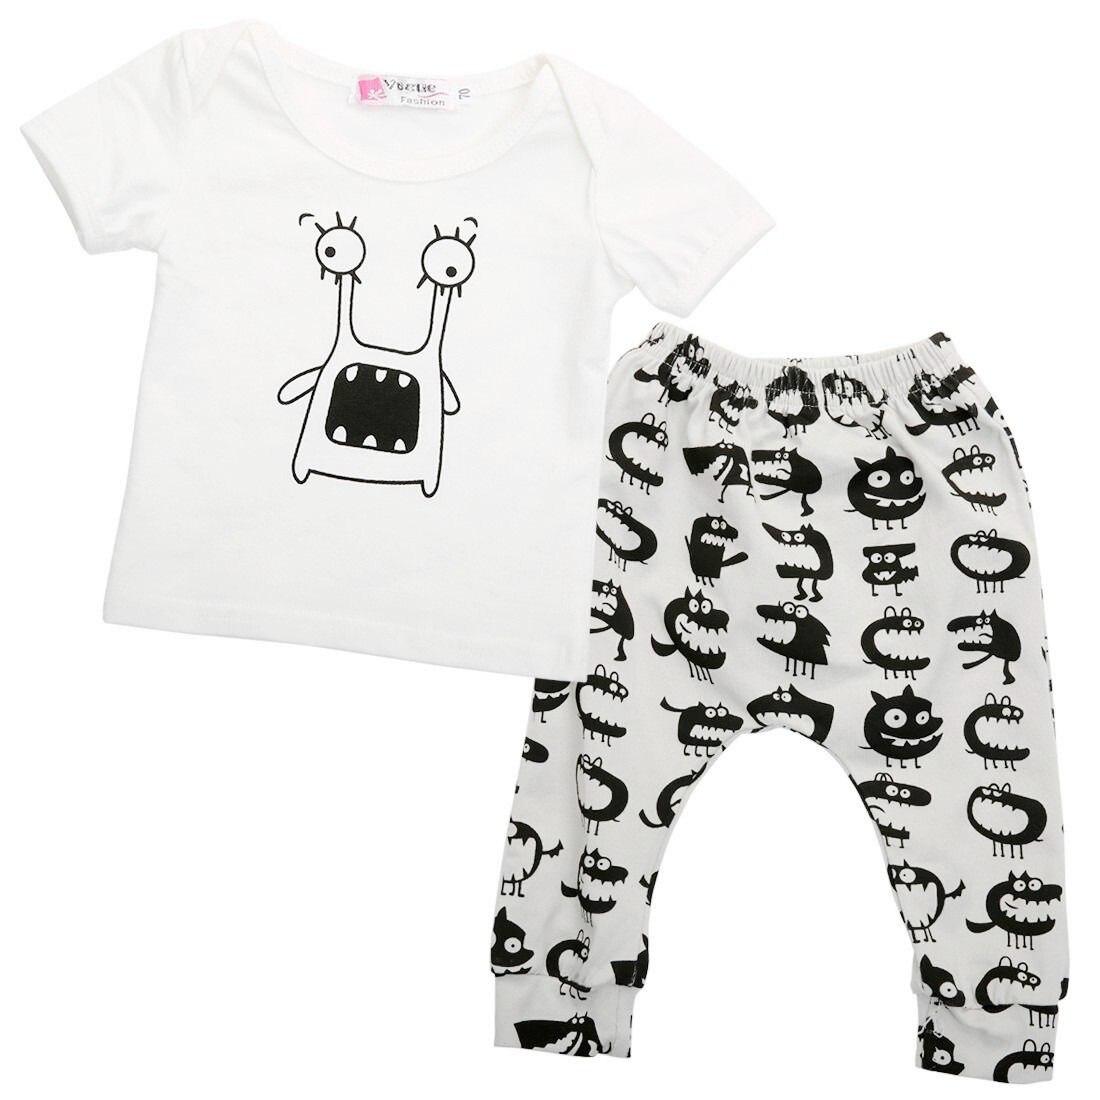 2pcs Newborn Toddler Baby Boys Outfits T-shirt Tops + Long Pants Kids Clothes Sets Wholesale